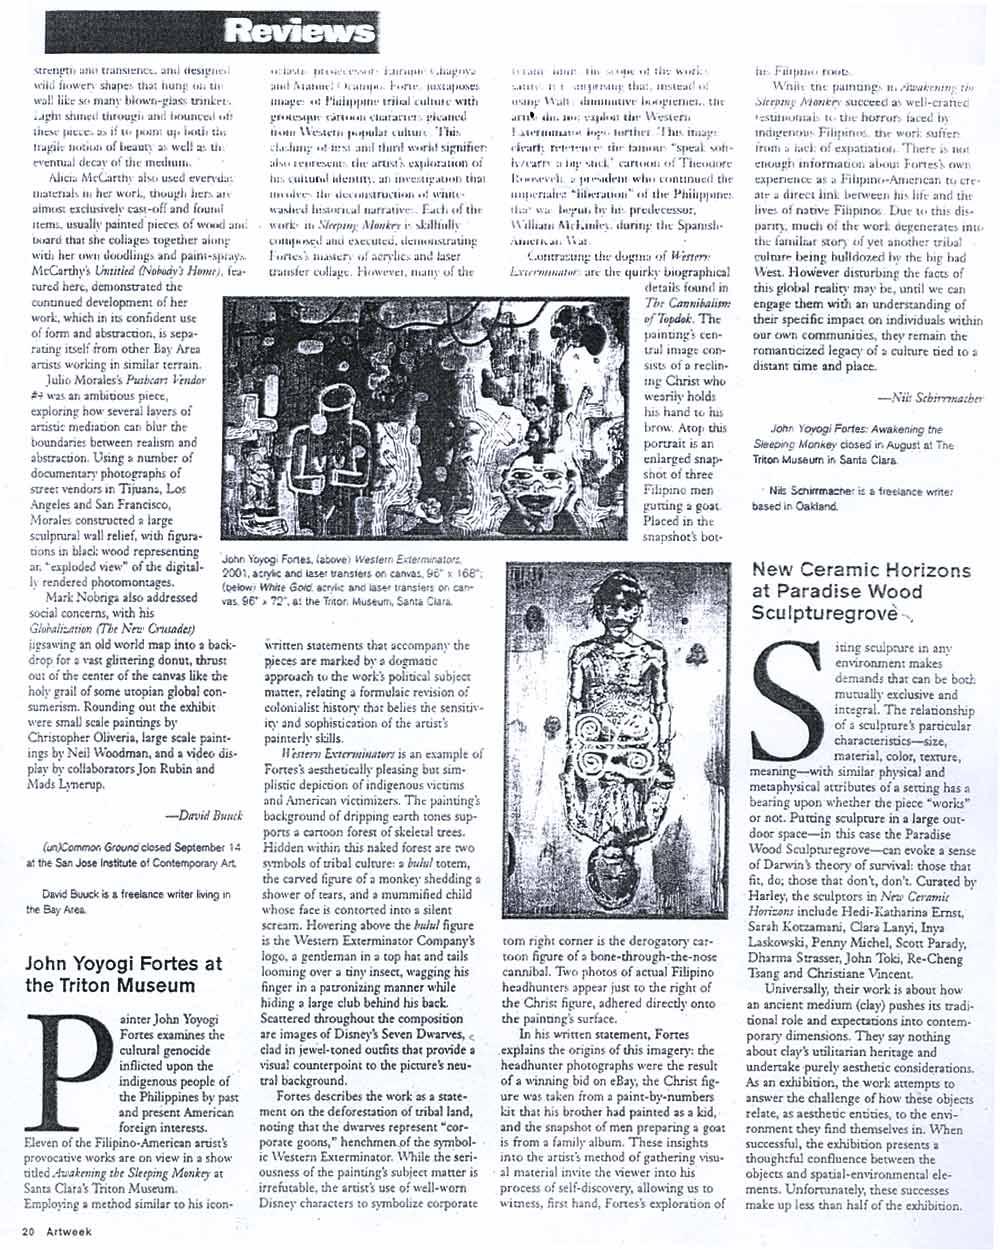 """John Yoyogi Fortes at the Triton Museum, article"